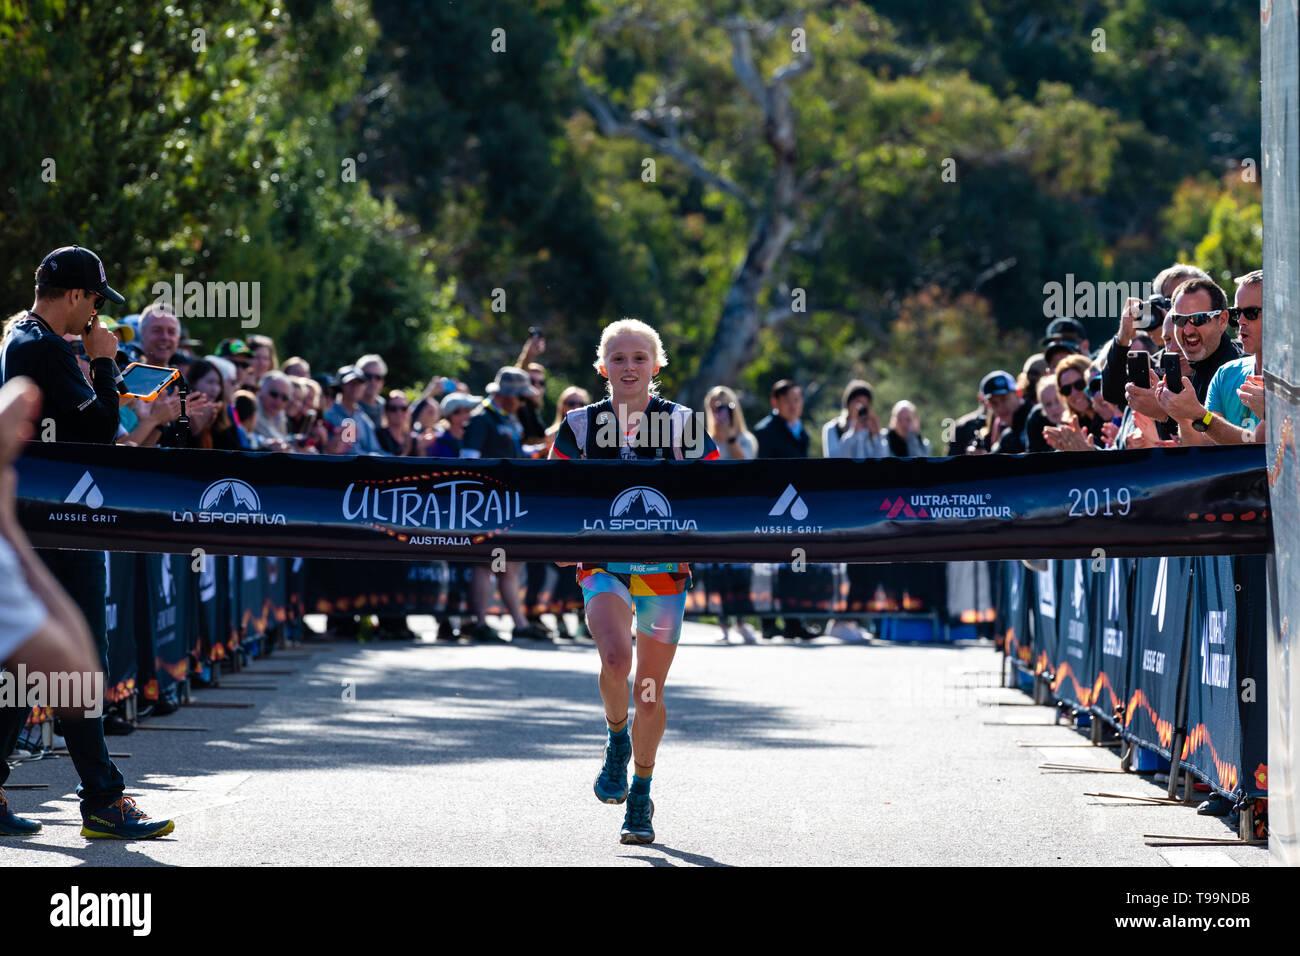 Blue Mountains, Australia - April 16 2019: Ultra-Trail Australia UTA11 race. Runner Paige Penrose, winner of the womens event, at the finish line. - Stock Image